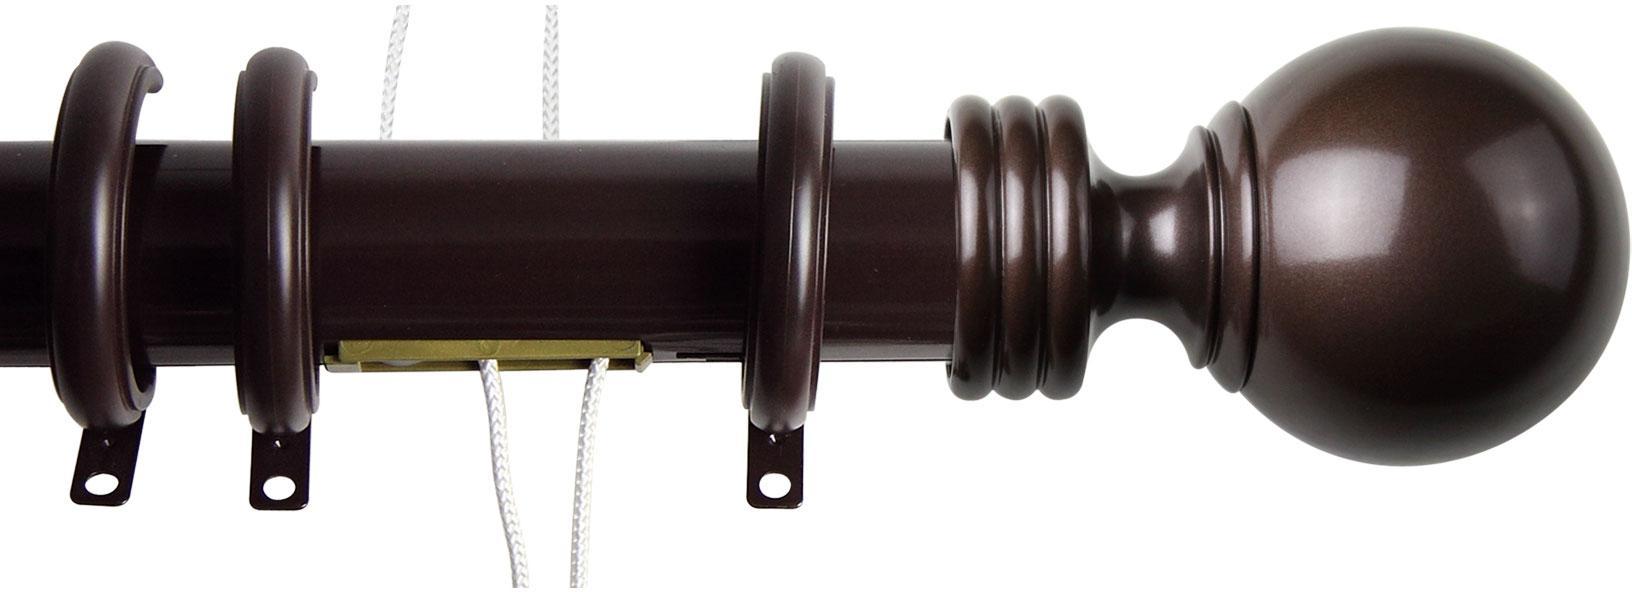 Ball Traverse Rod Rings Cocoa